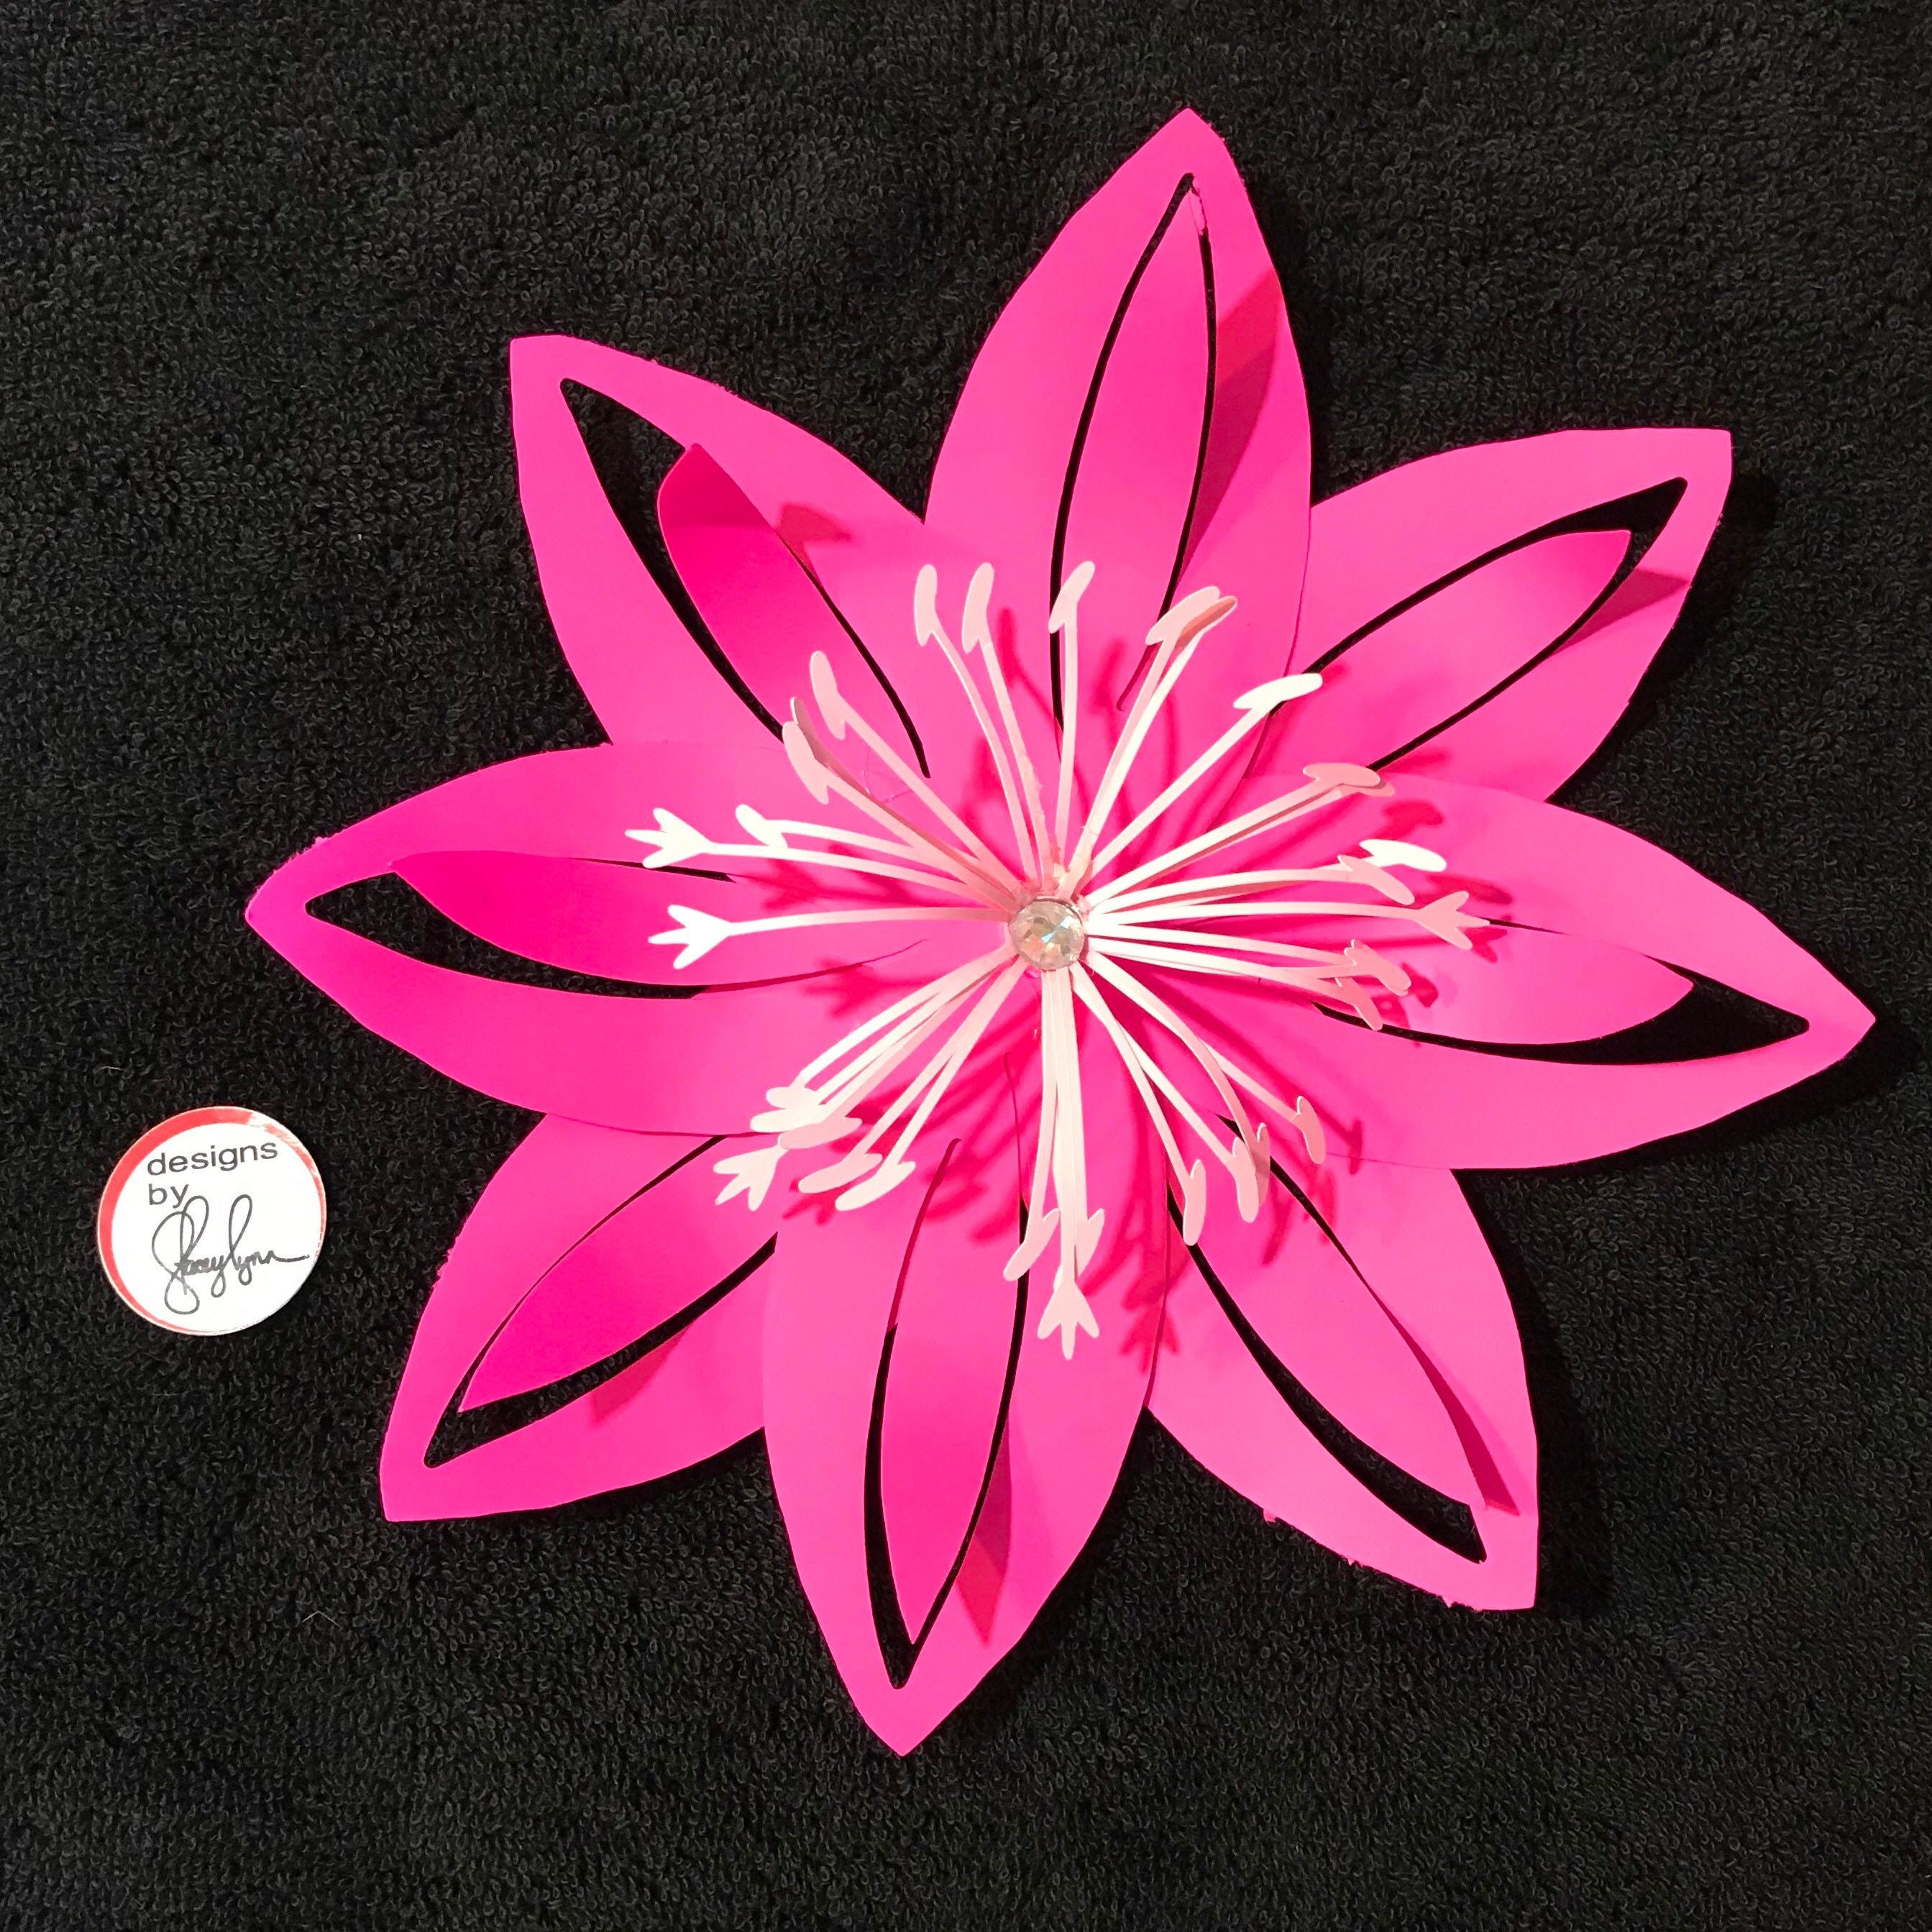 Giant Paper Flower Use For Paper Flower Backdrop Flower Photo